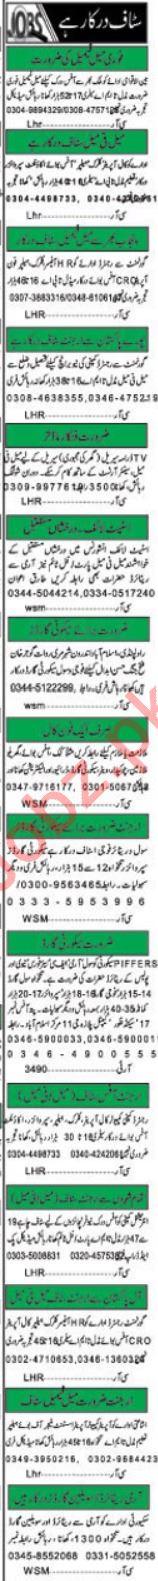 Khabrain Newspaper Classified Ads 2019 For Islamabad